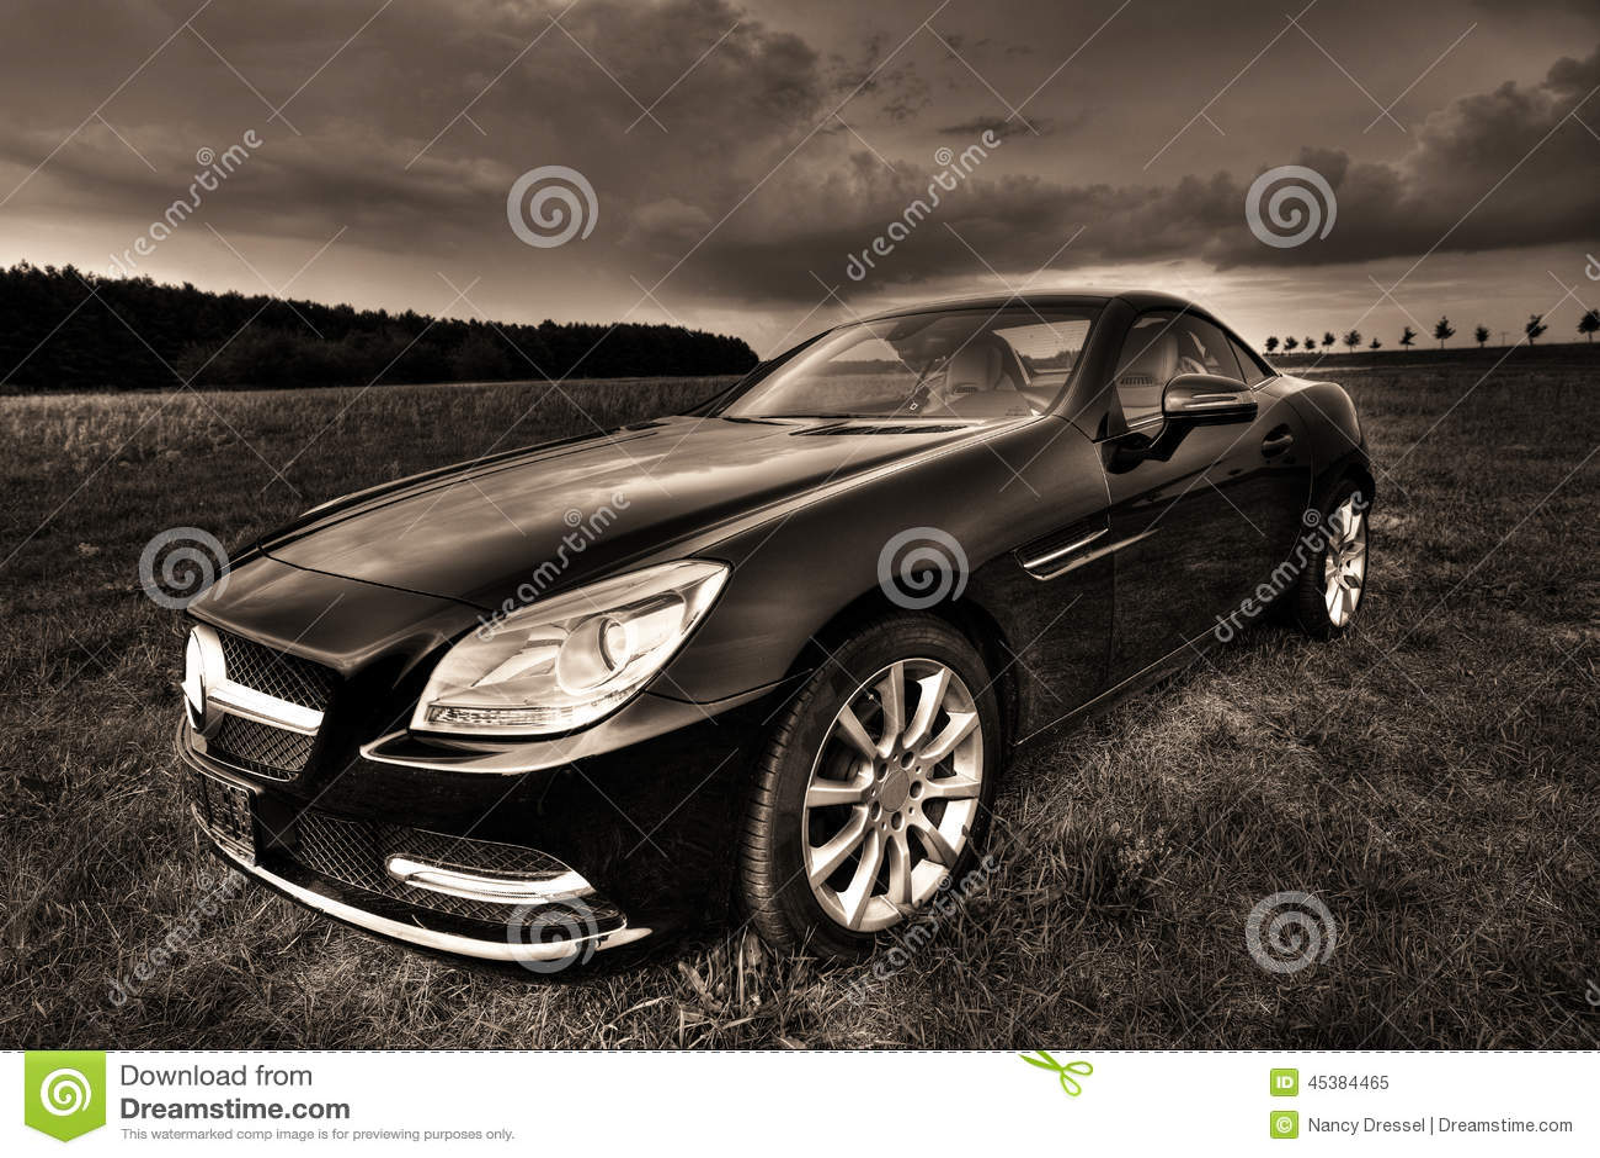 mercedes slk 200 cabrio stock image image of autos lifestyle 45384465. Black Bedroom Furniture Sets. Home Design Ideas